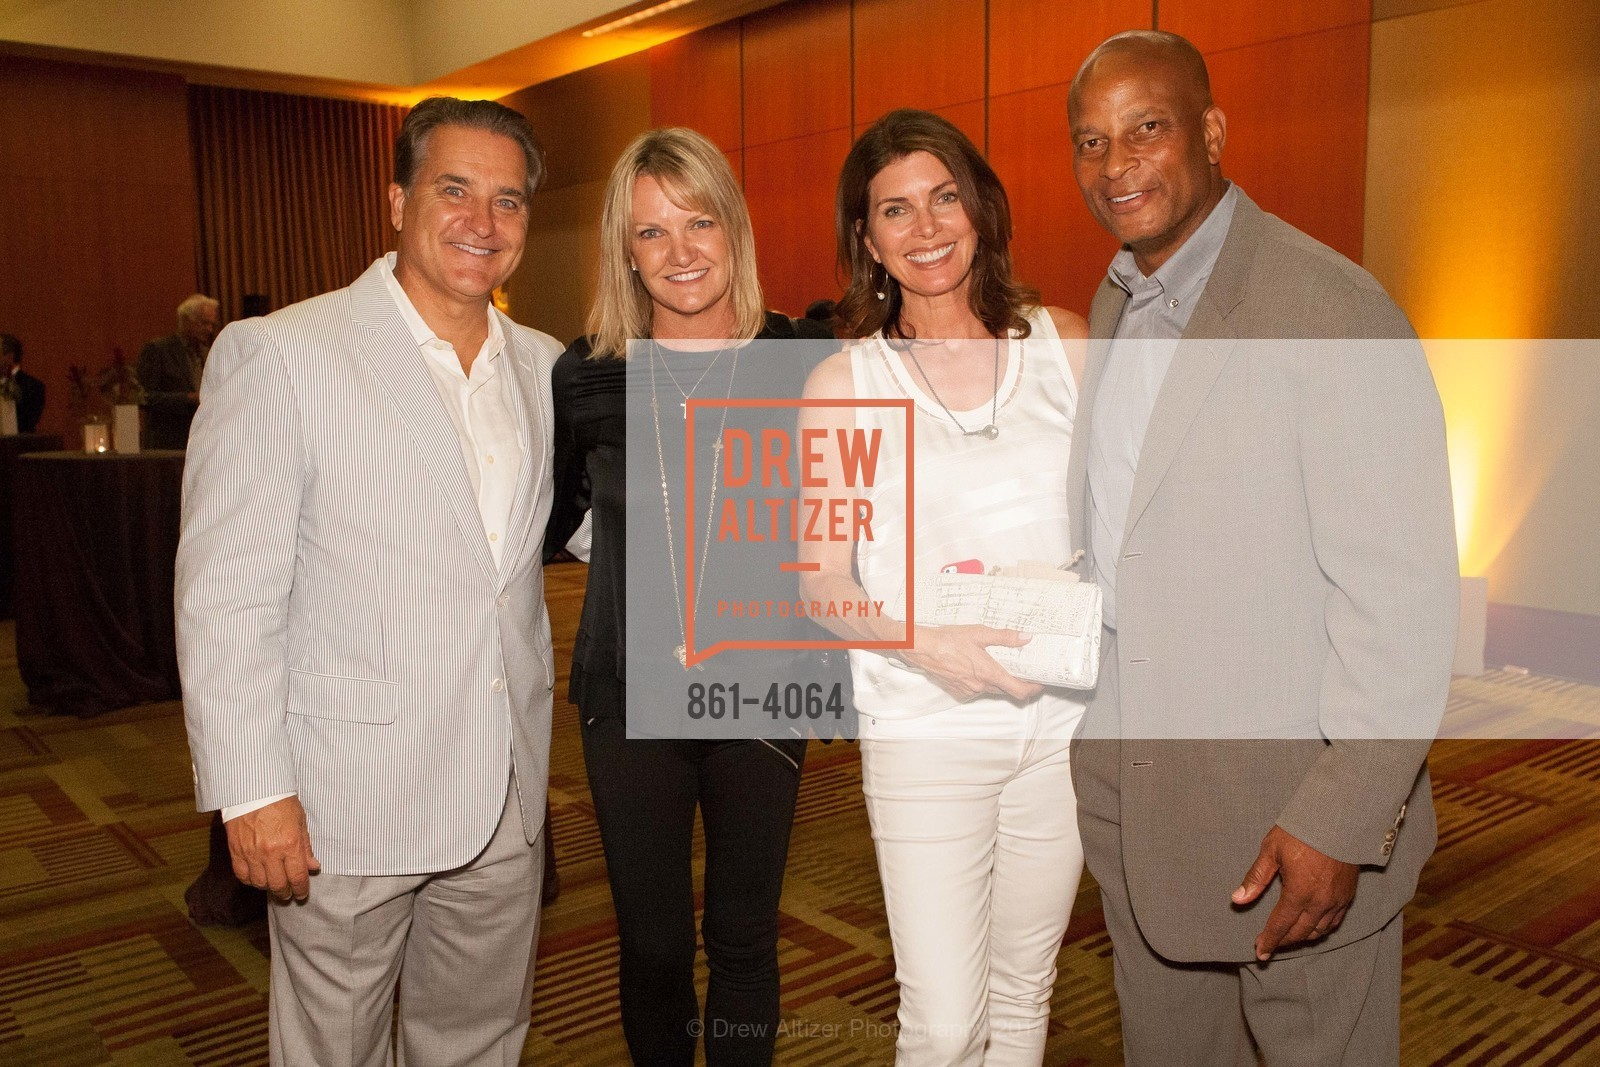 Steve Mariucci, Gayle Mariucci, Karen Lott, Ronnie Lott, Photo #861-4064